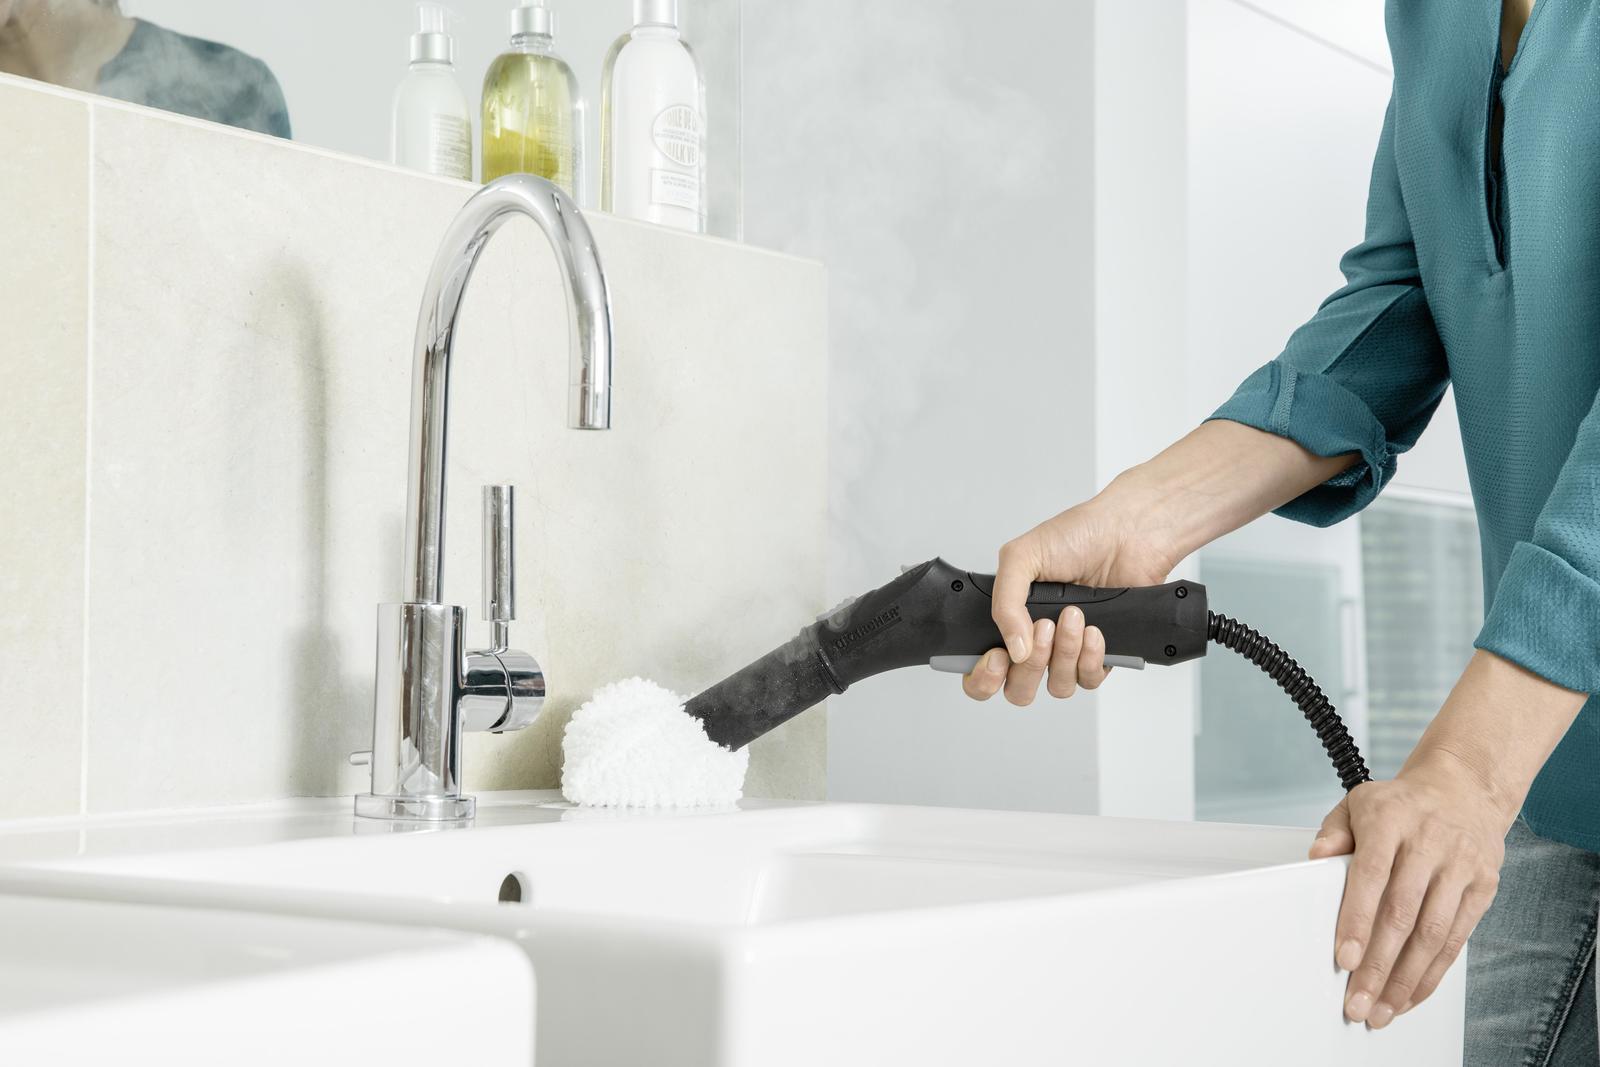 steam cleaner sc 5 easyfix premium karcher australia. Black Bedroom Furniture Sets. Home Design Ideas